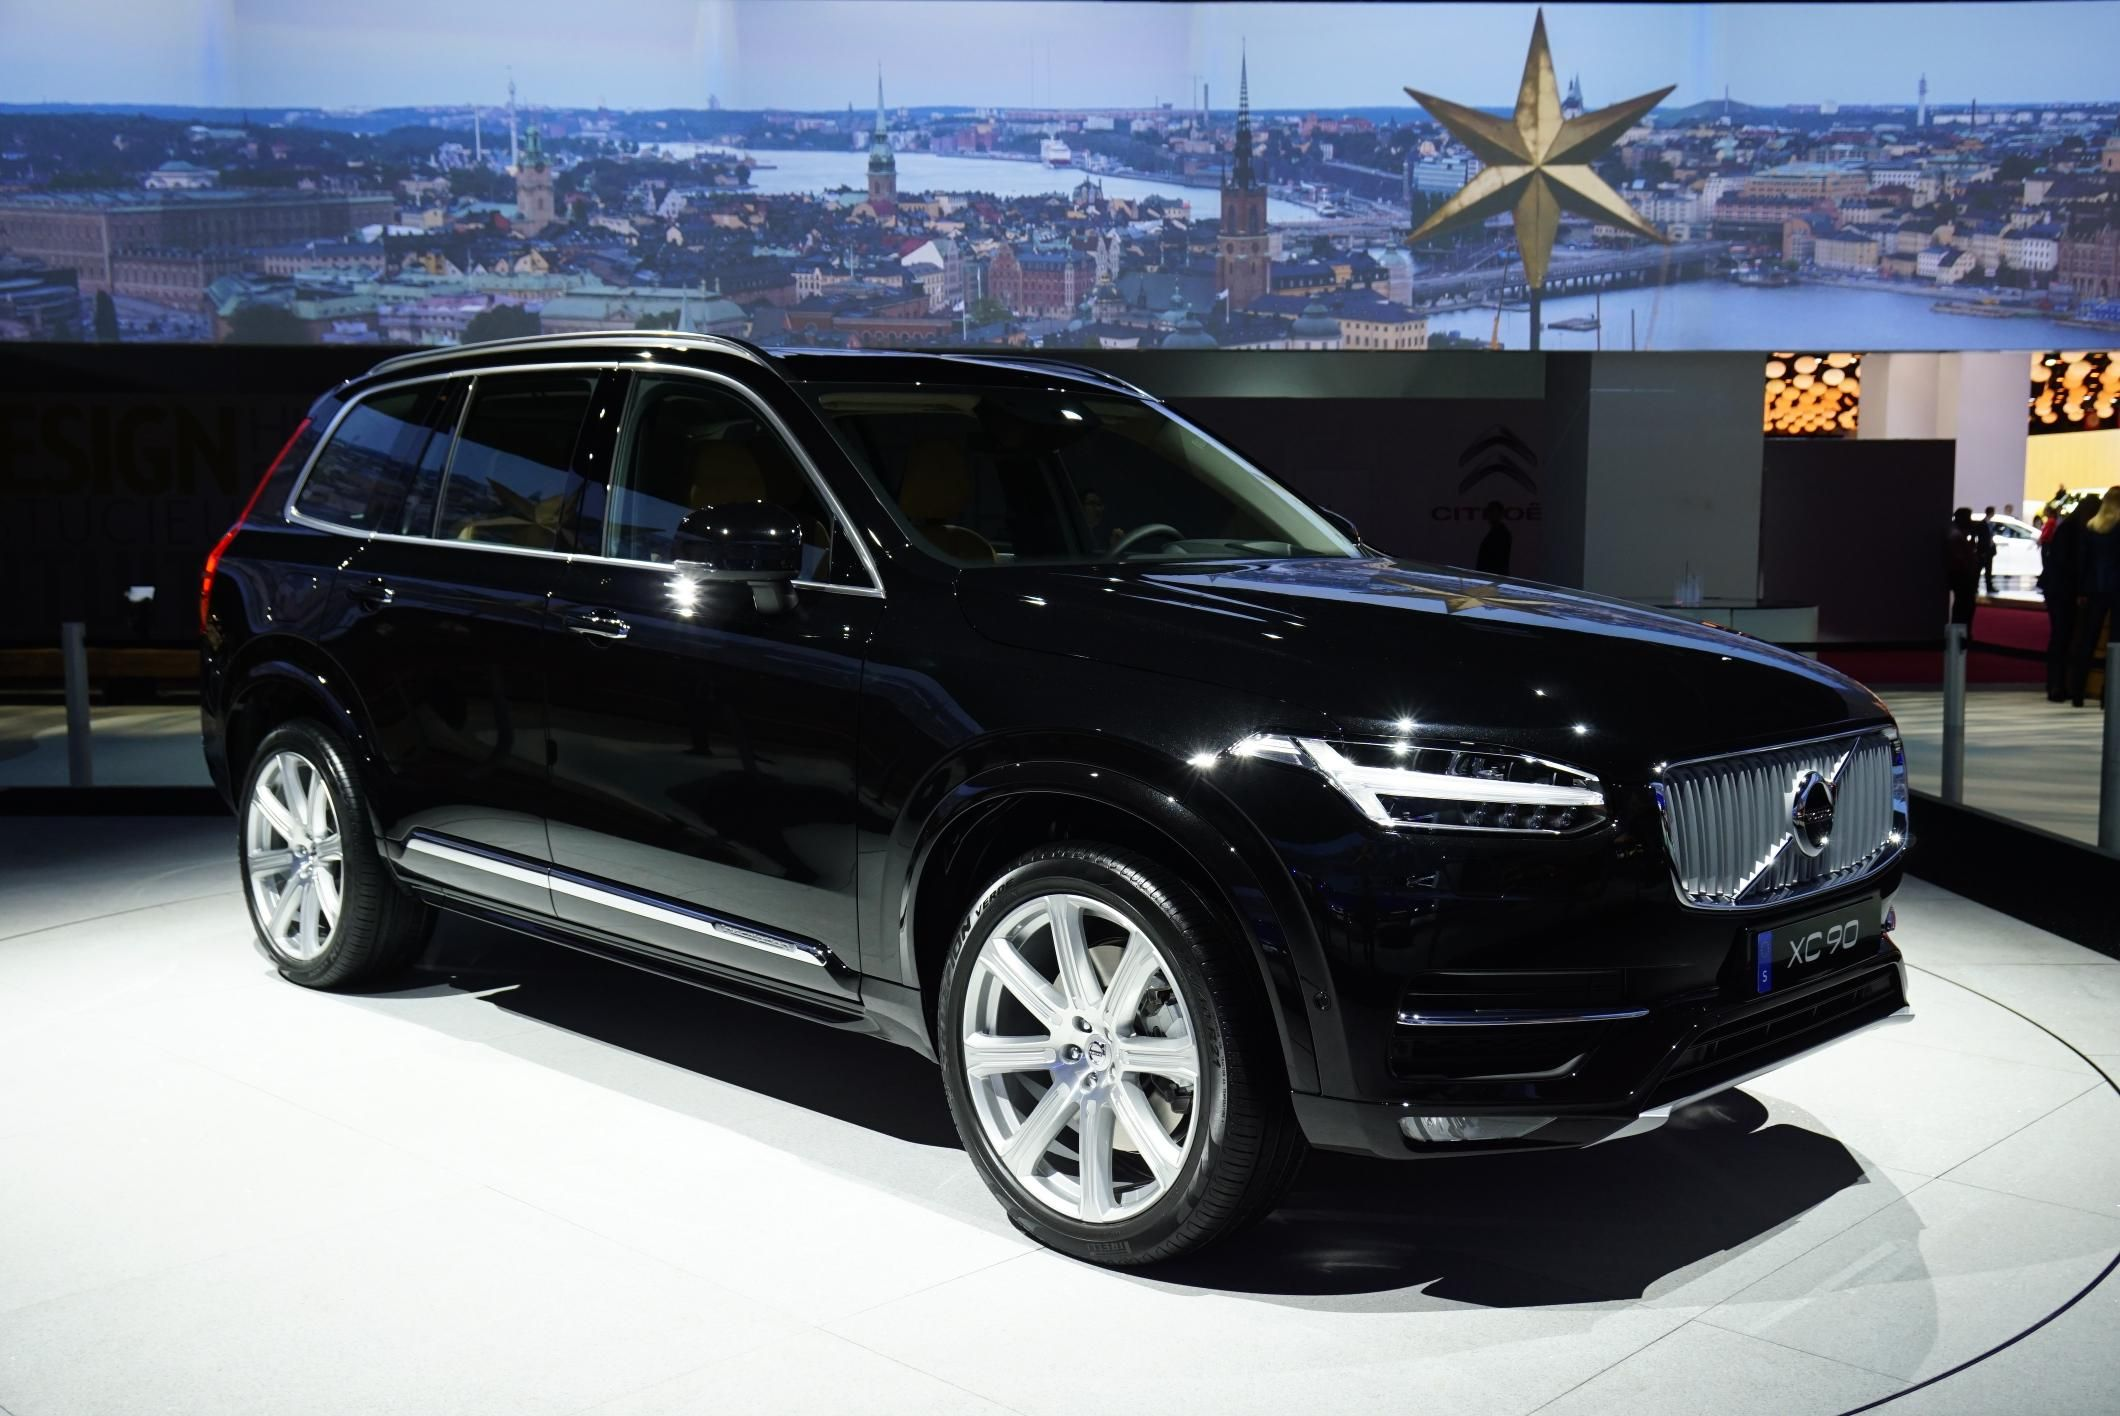 2015 Volvo XC90 | Volvo | Pinterest | Volvo xc90, Volvo and Cars